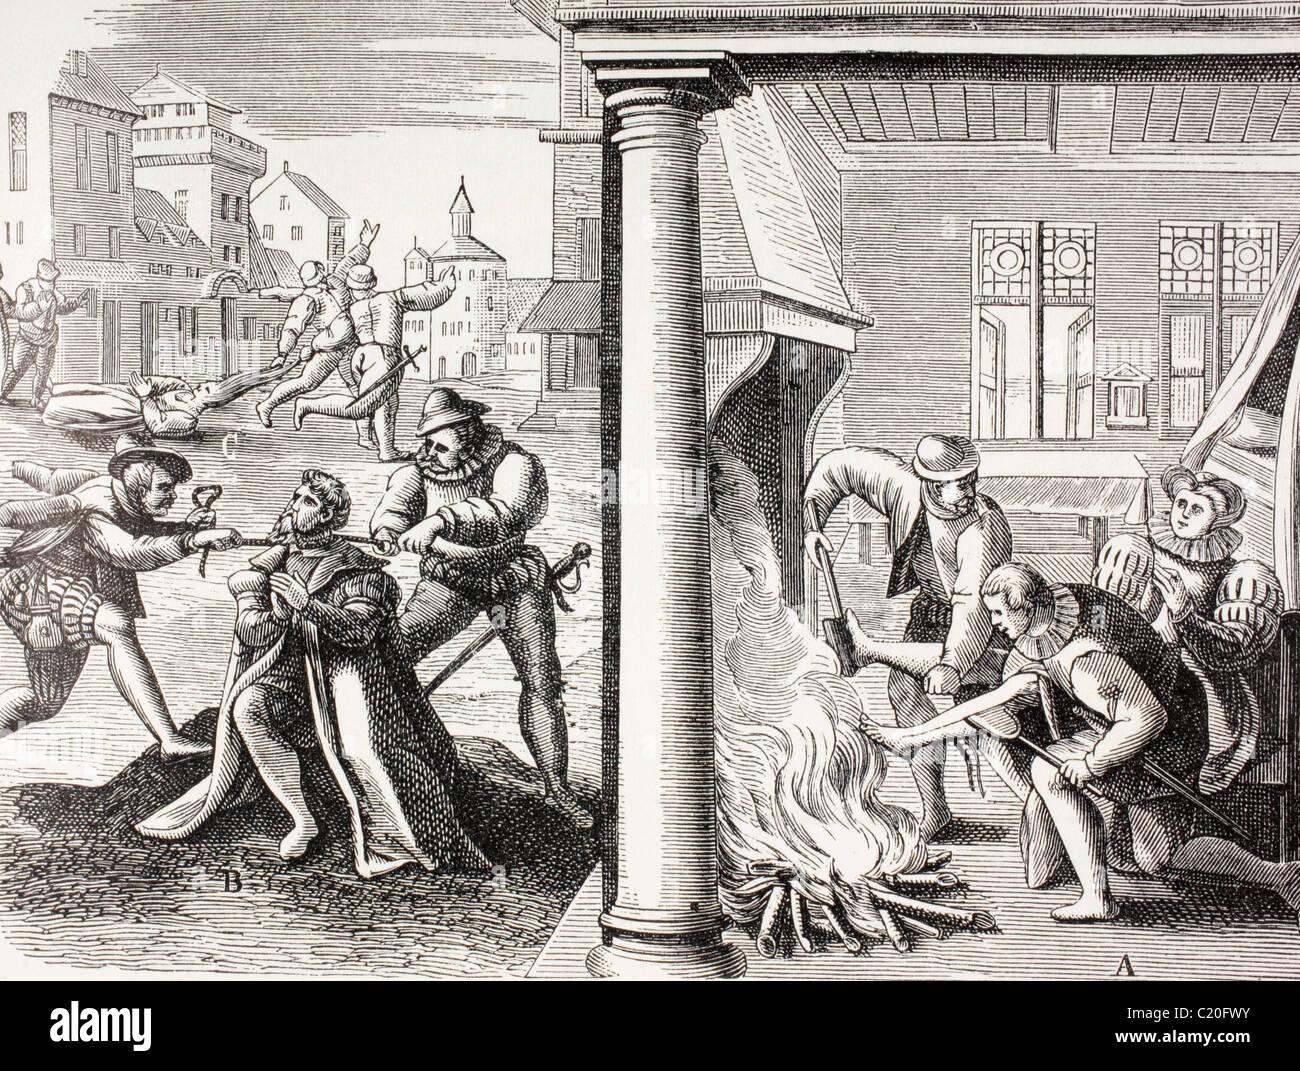 16th century propaganda illustrating violence of the French Huguenots against the Catholics. Stock Photo